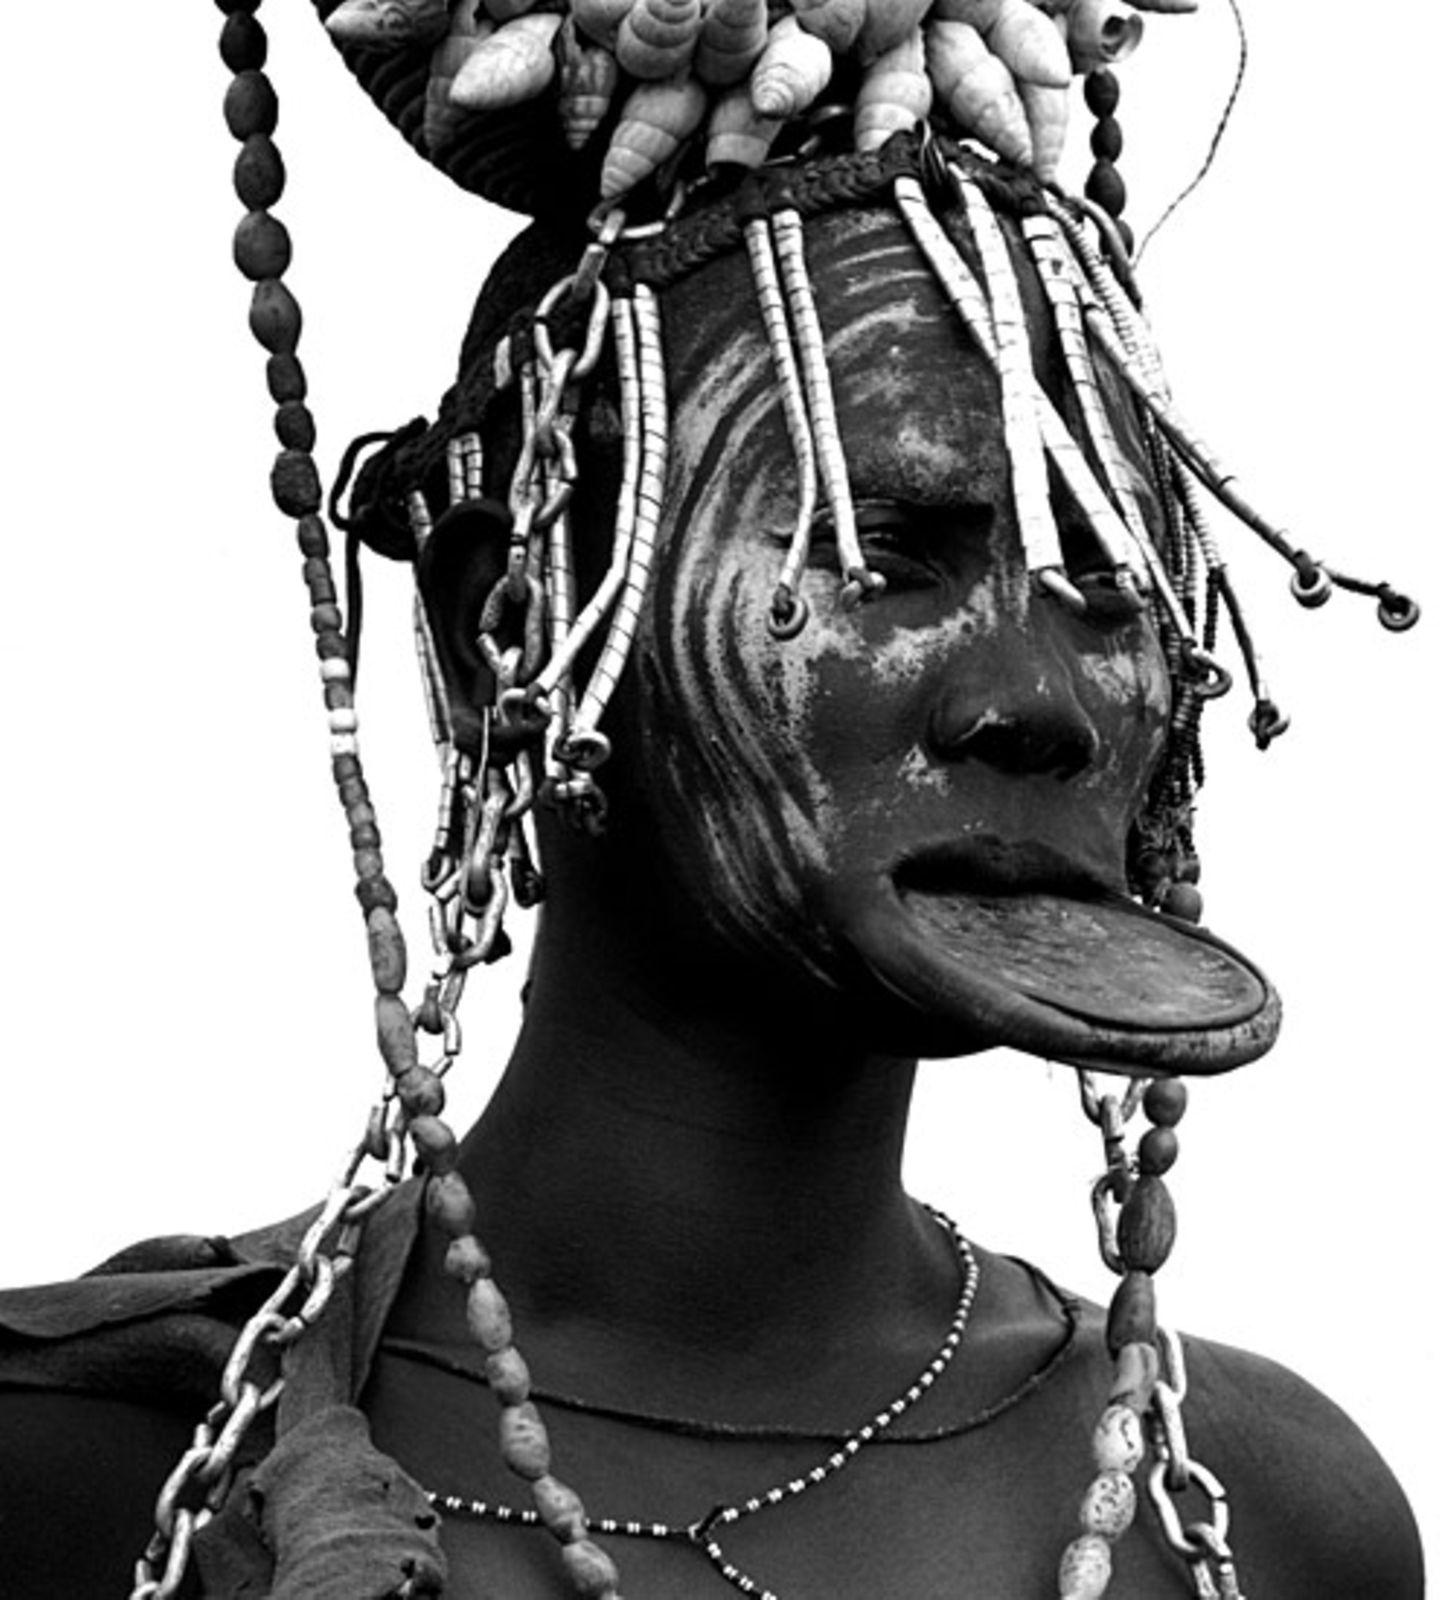 Fotogalerie: Bildband Ethiopia - Bild 5